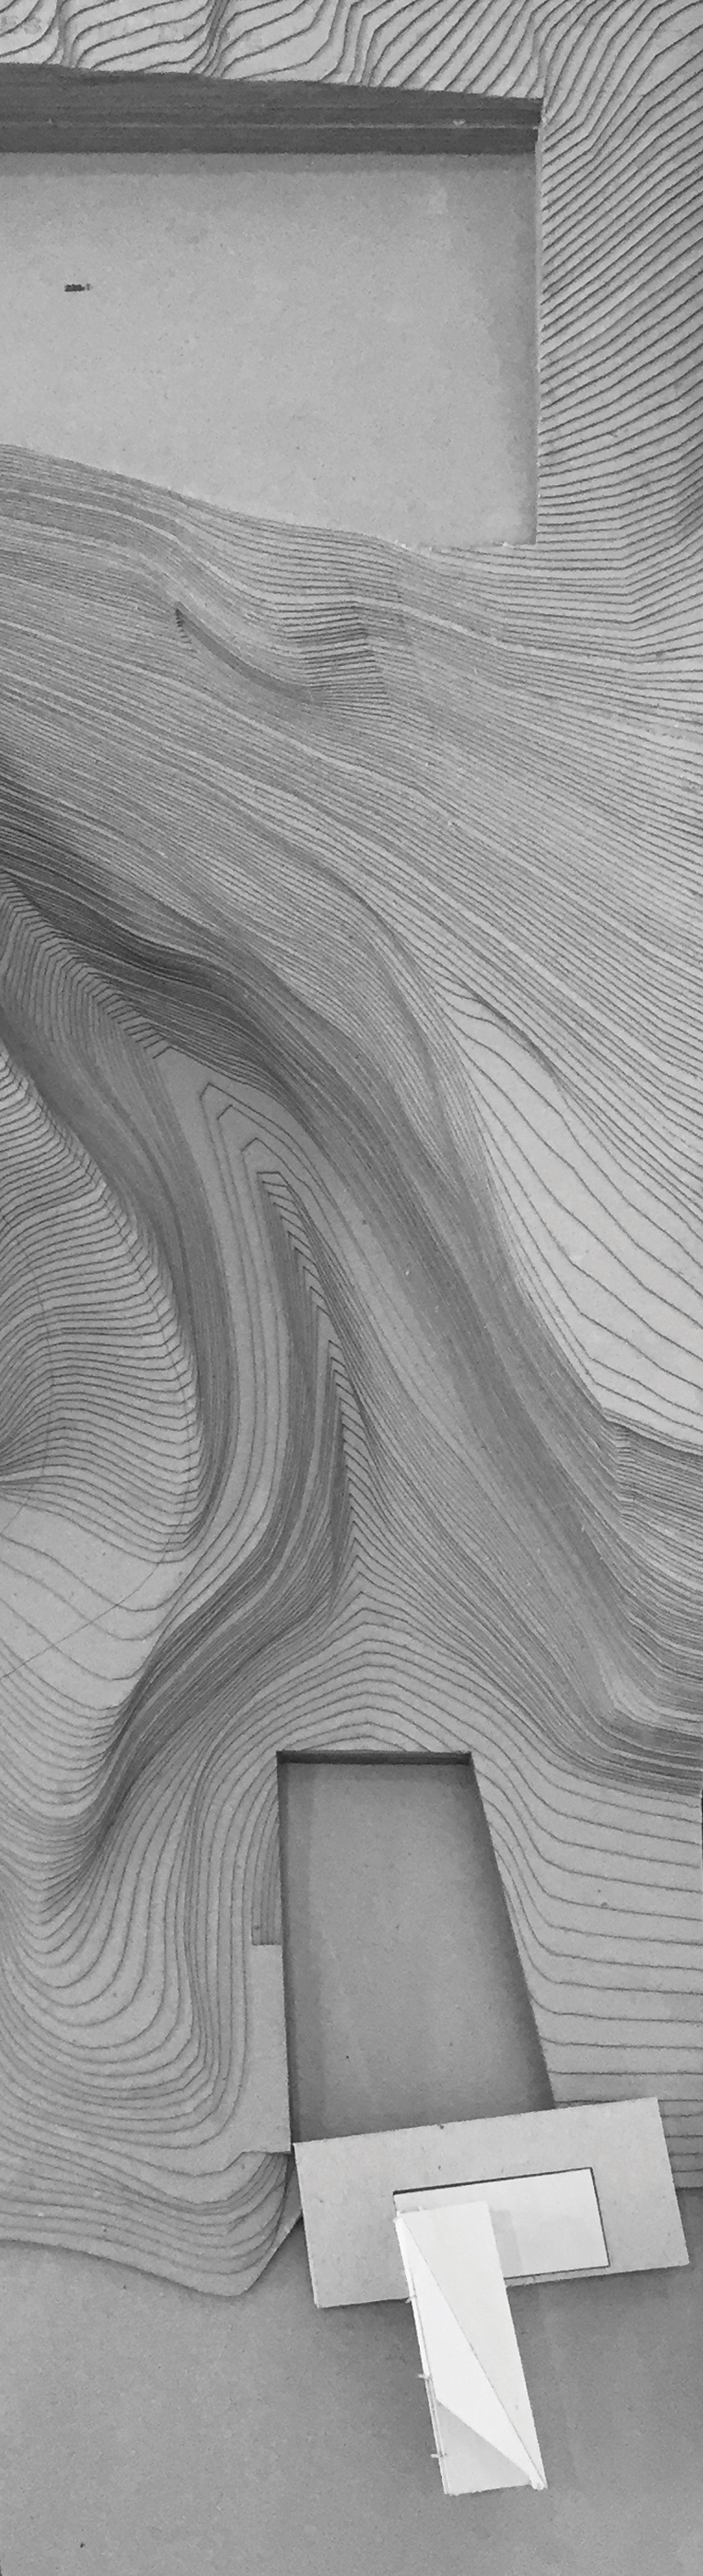 Matt Fajkus Architecture_Filtered Frame Dock_Physical Model_Site